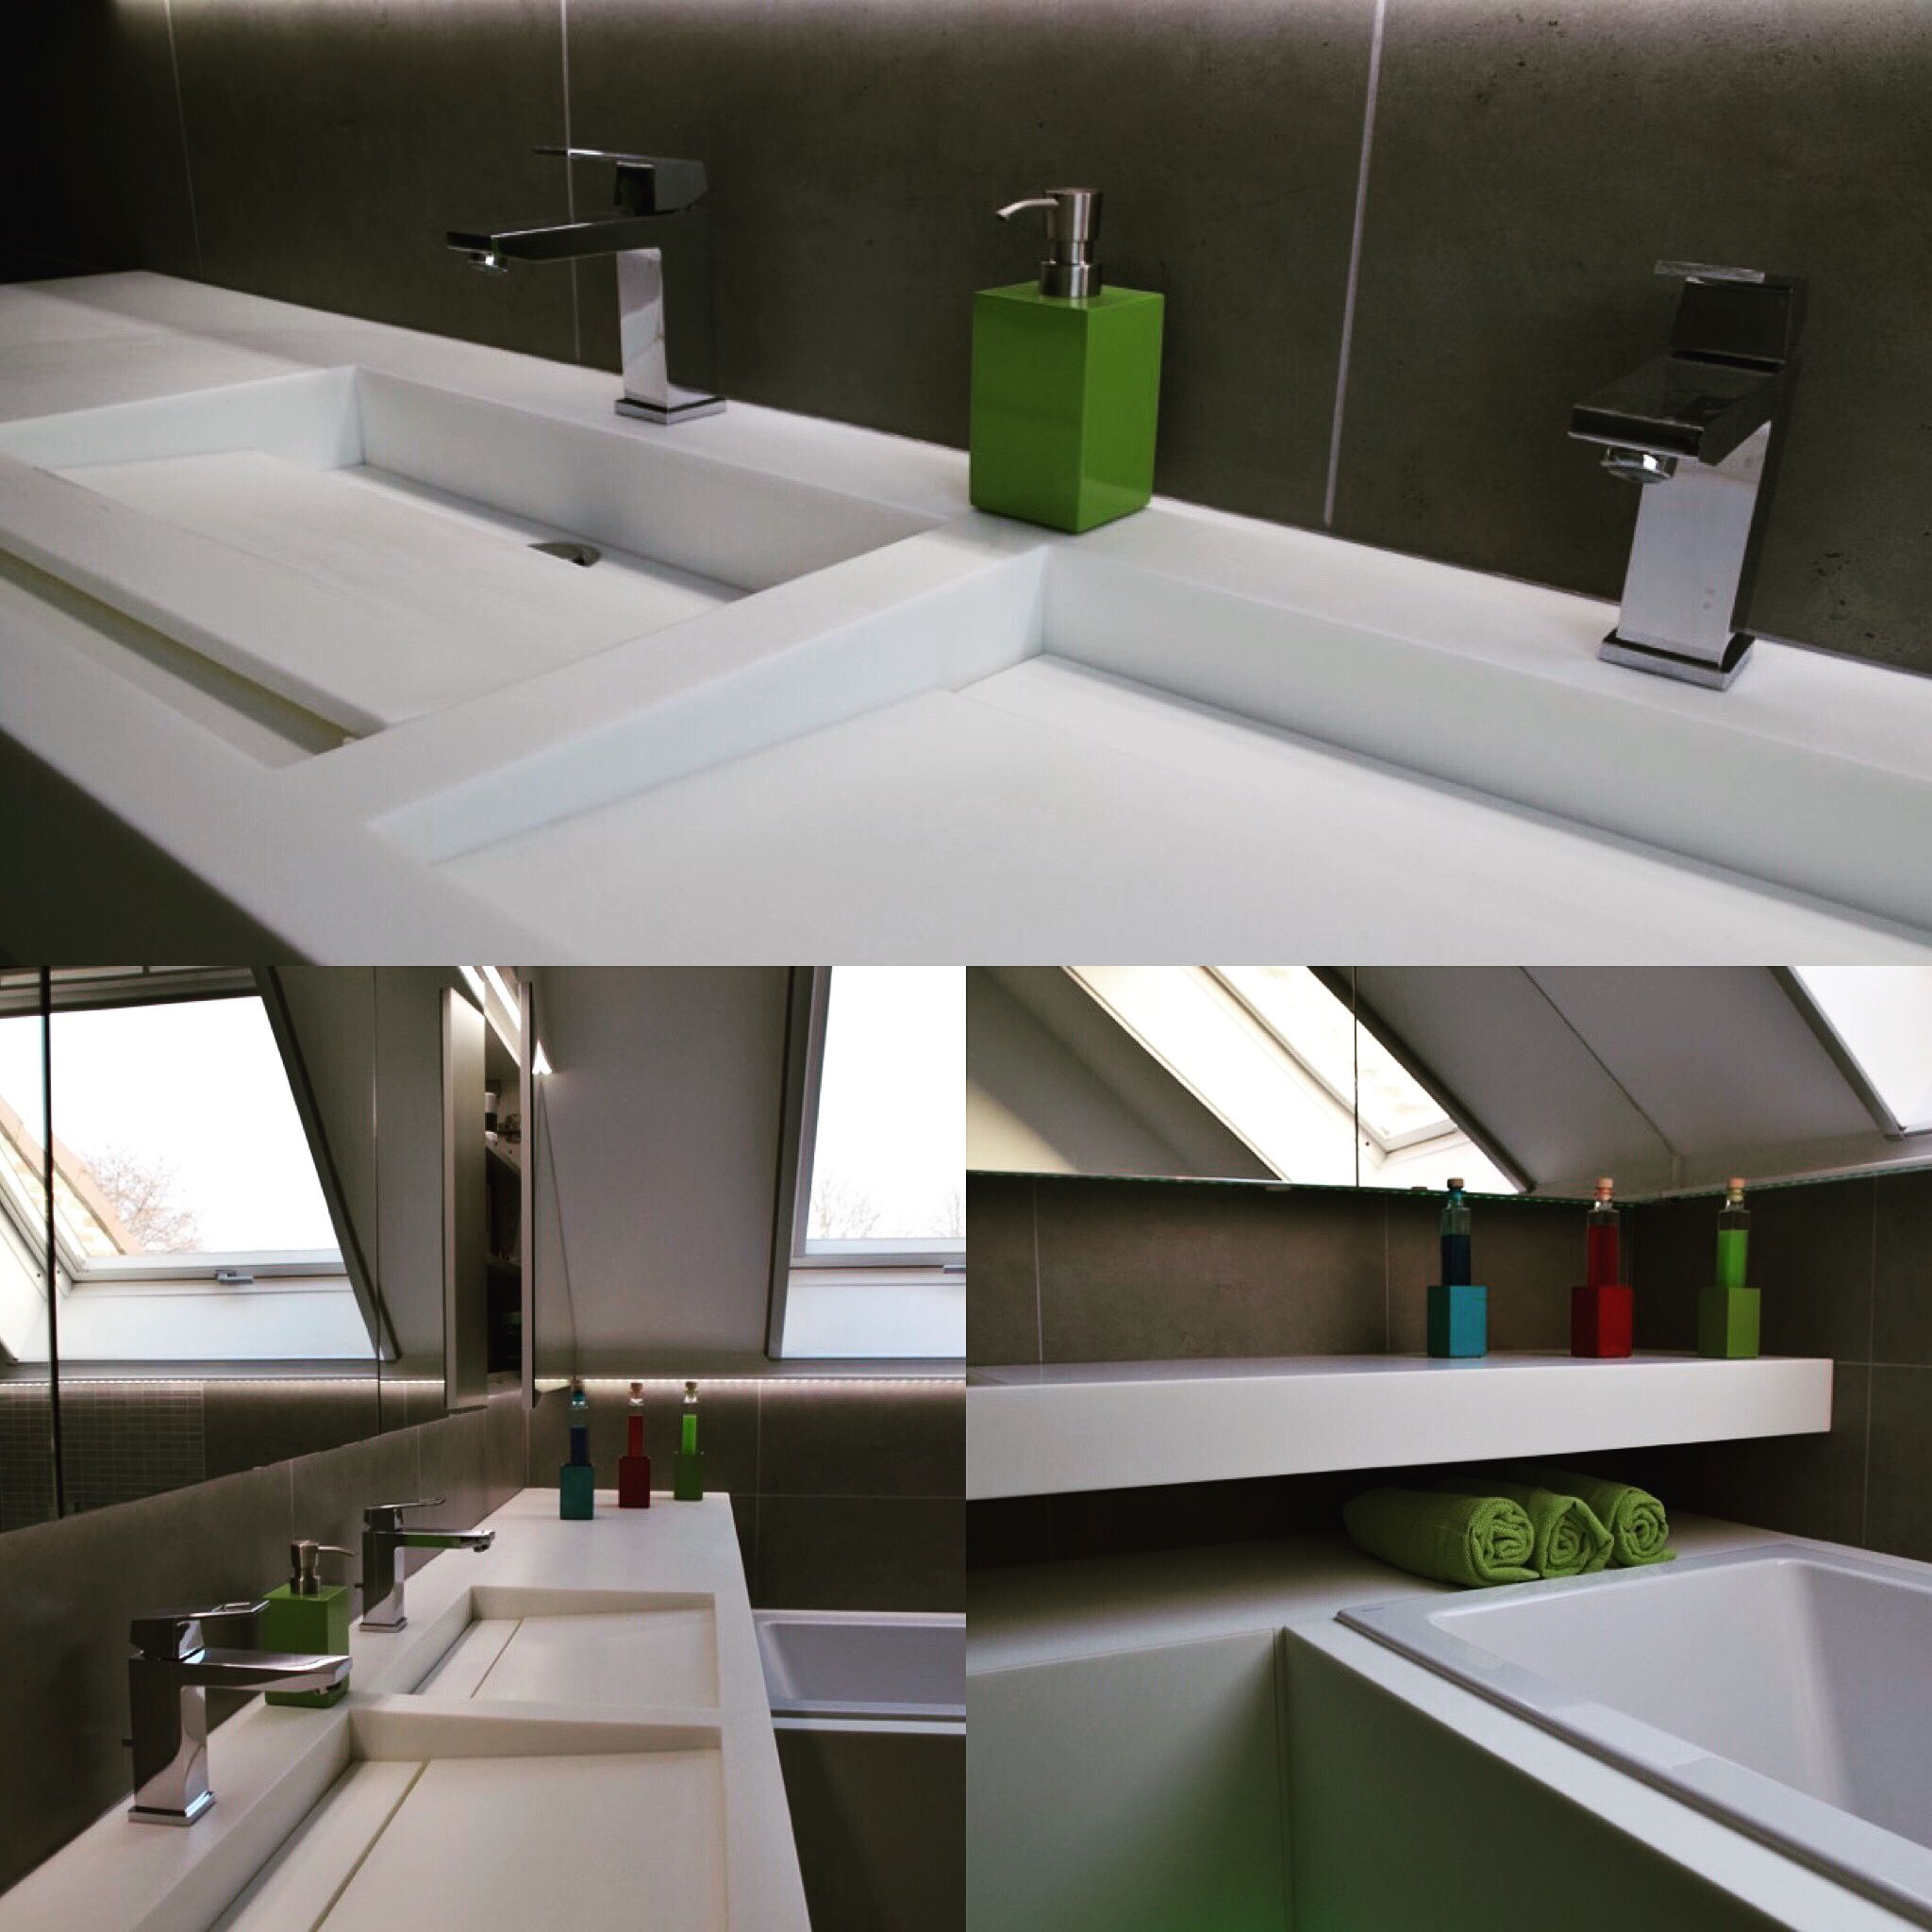 Volledige badkamer in Solid Surface, wastafel, ladefronten ...